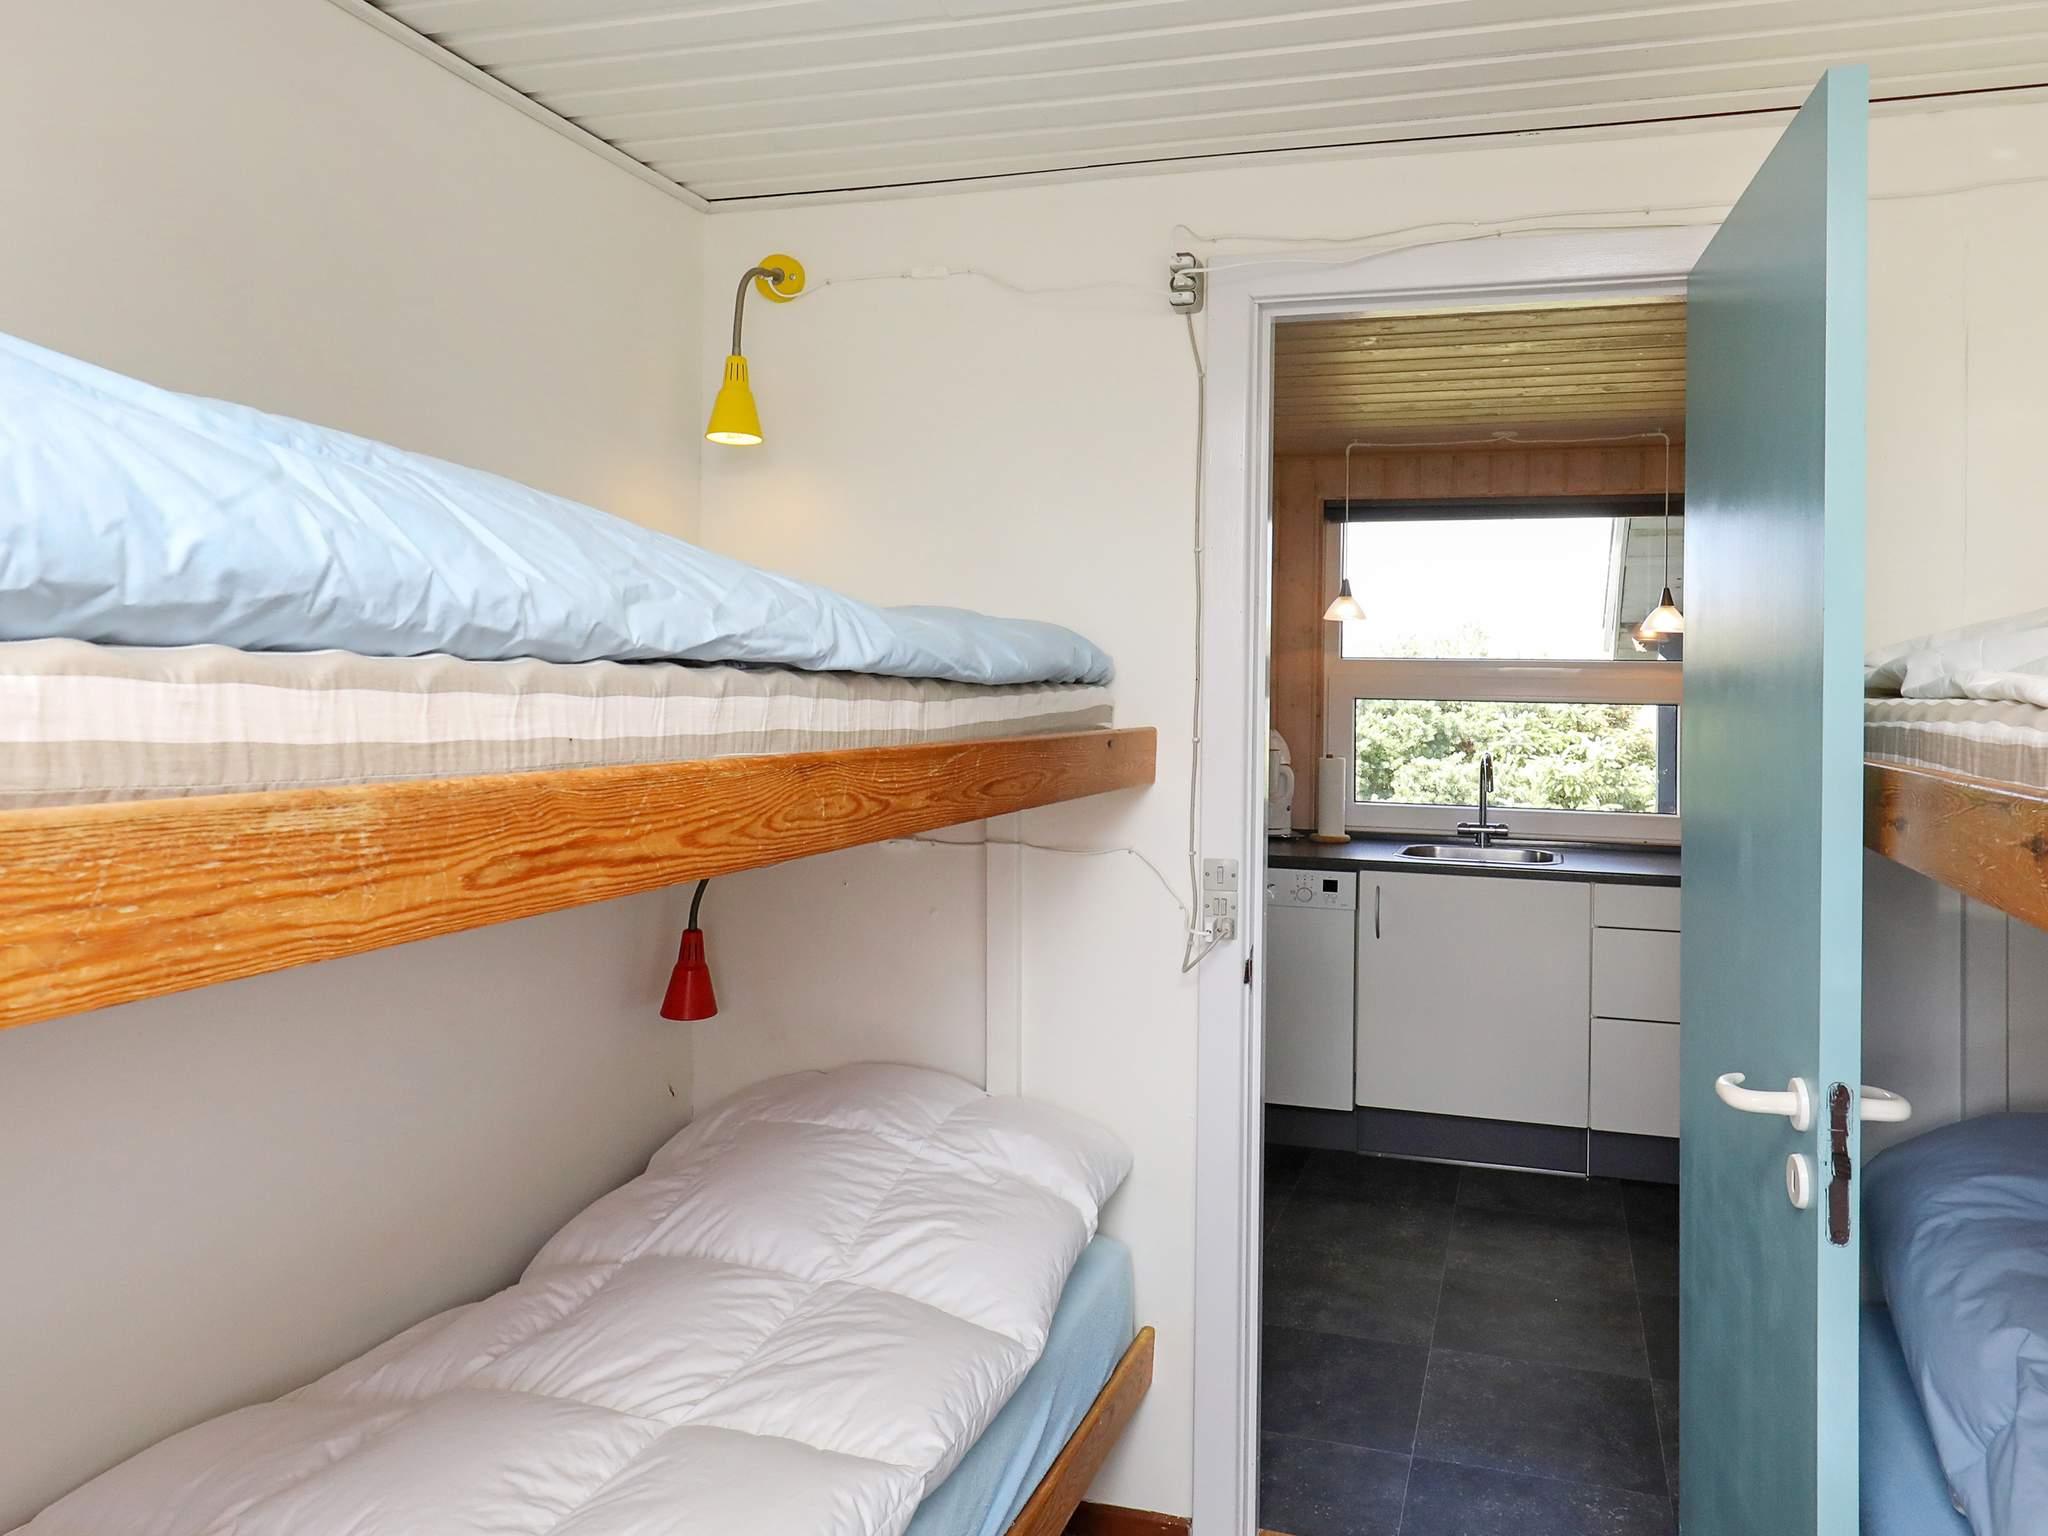 Ferienhaus Vrist (81919), Vrist, , Limfjord, Dänemark, Bild 11